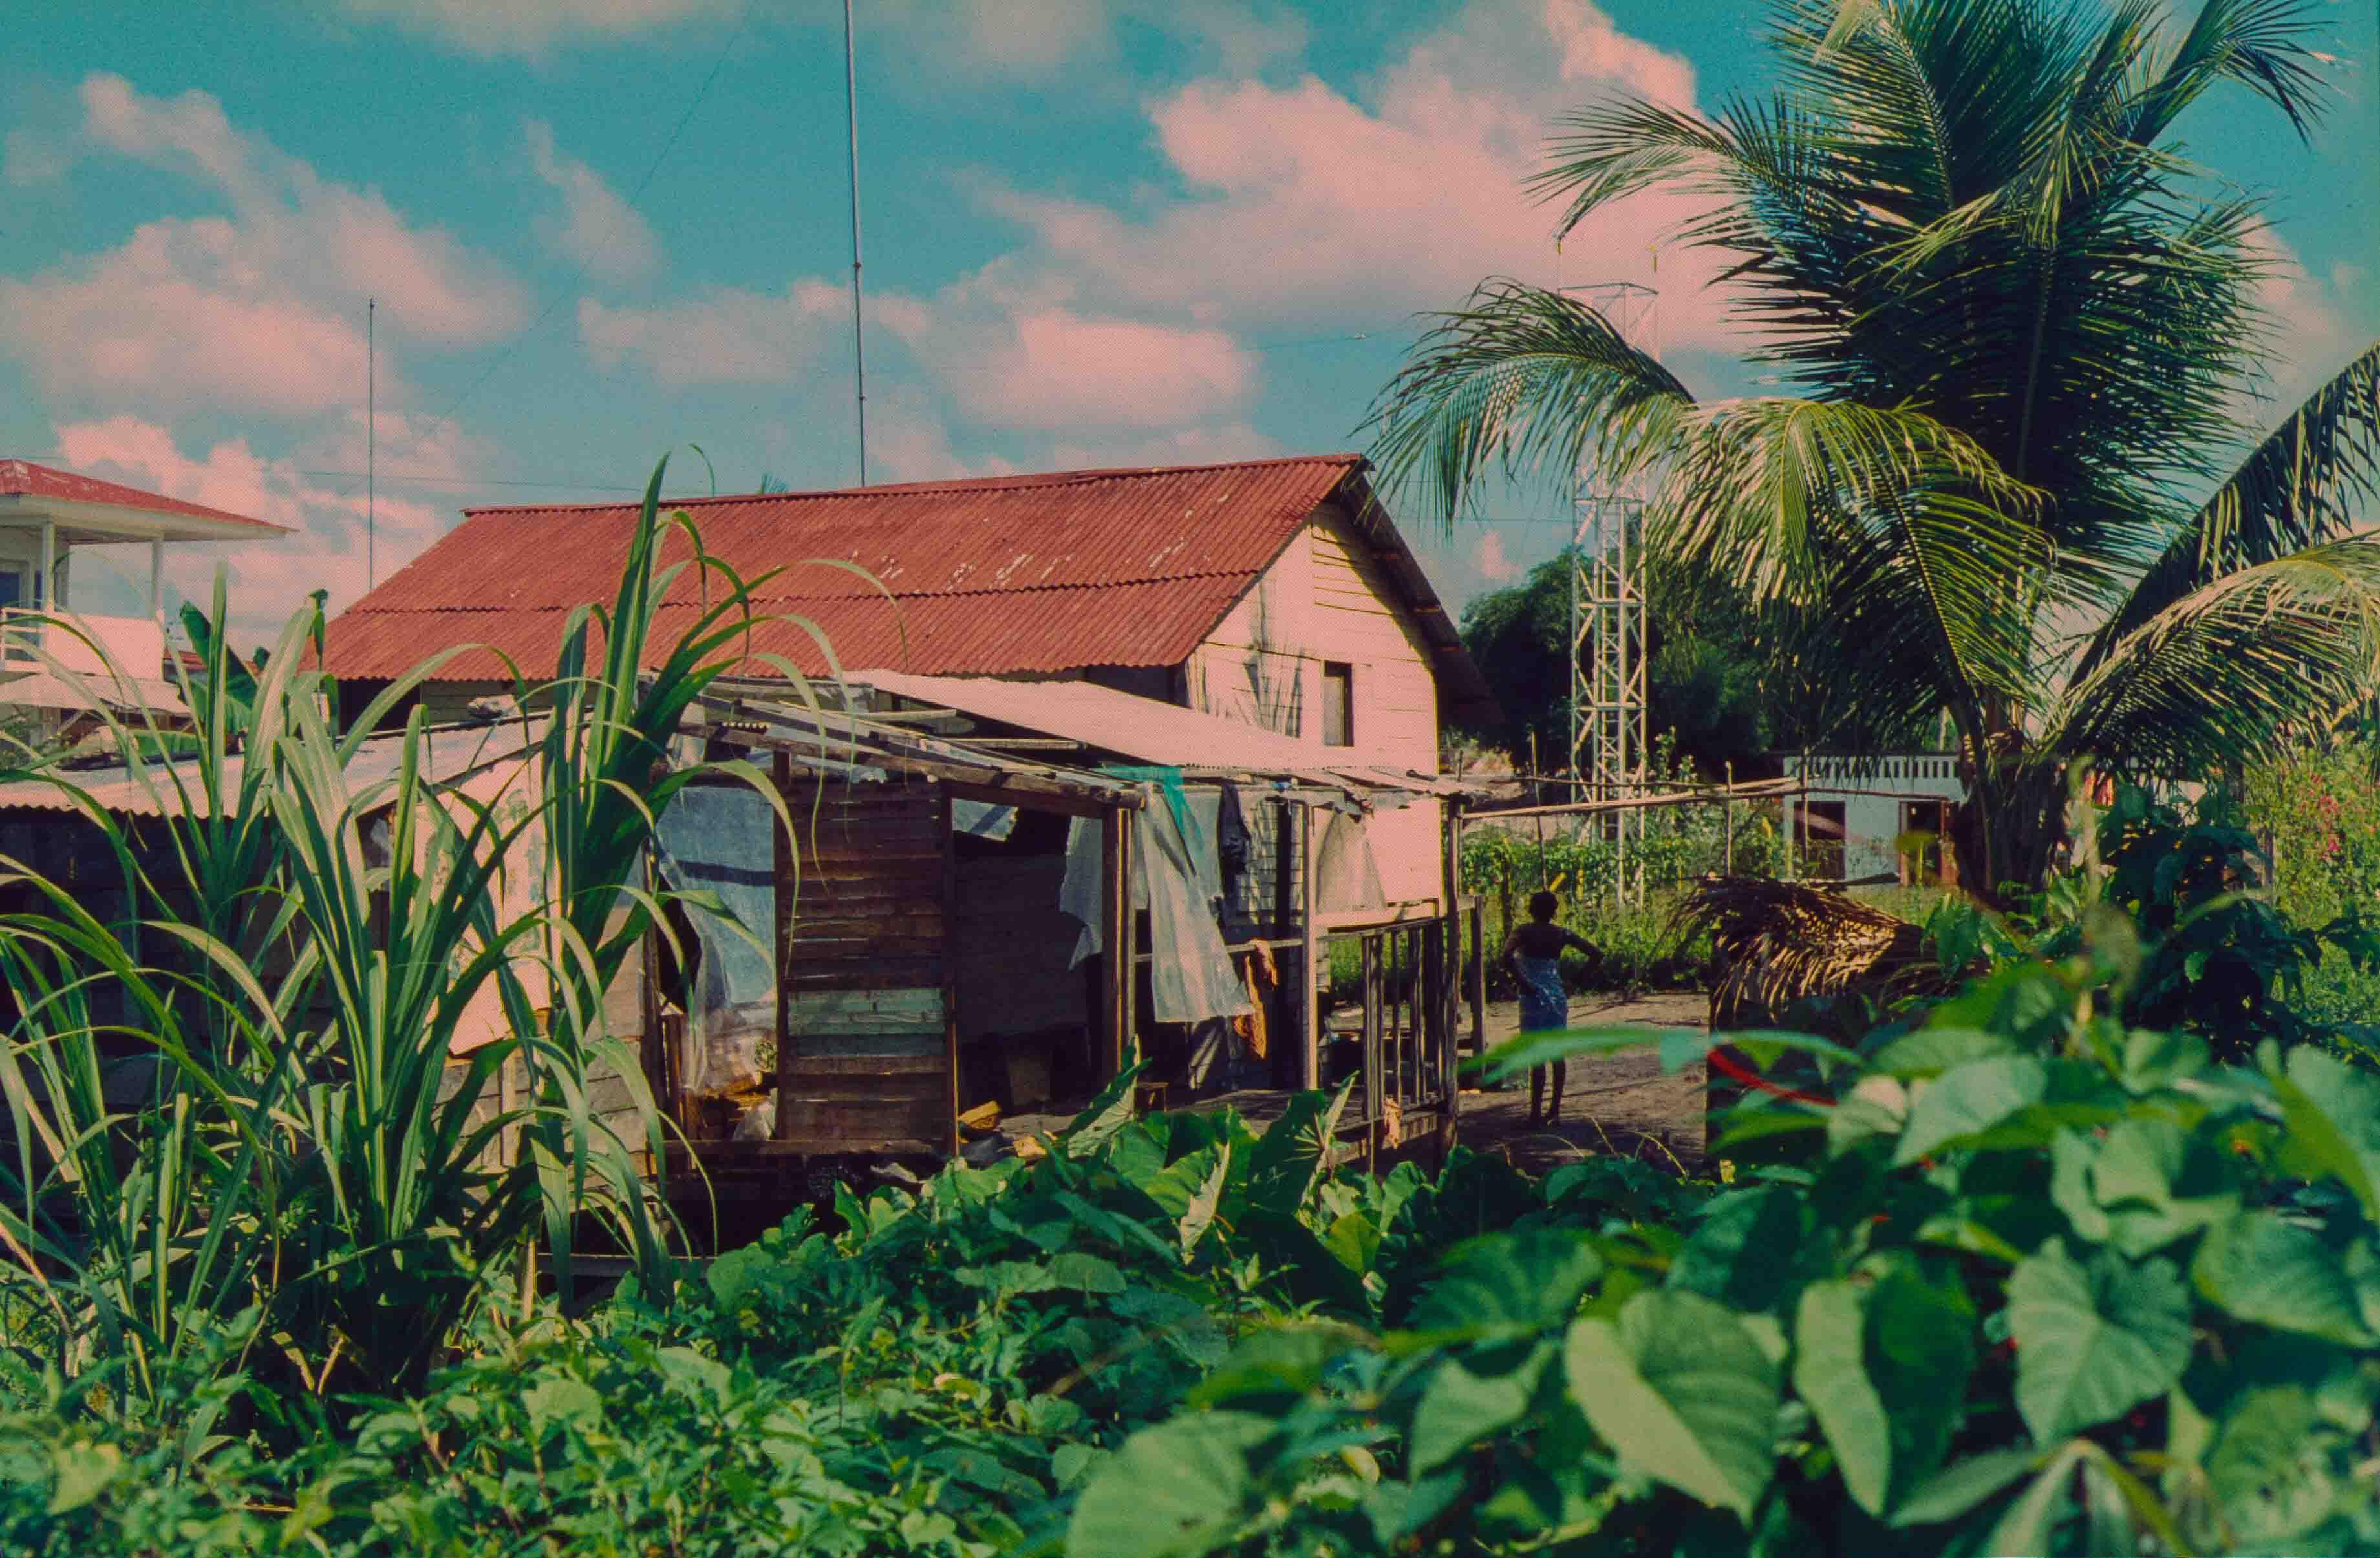 439. Suriname